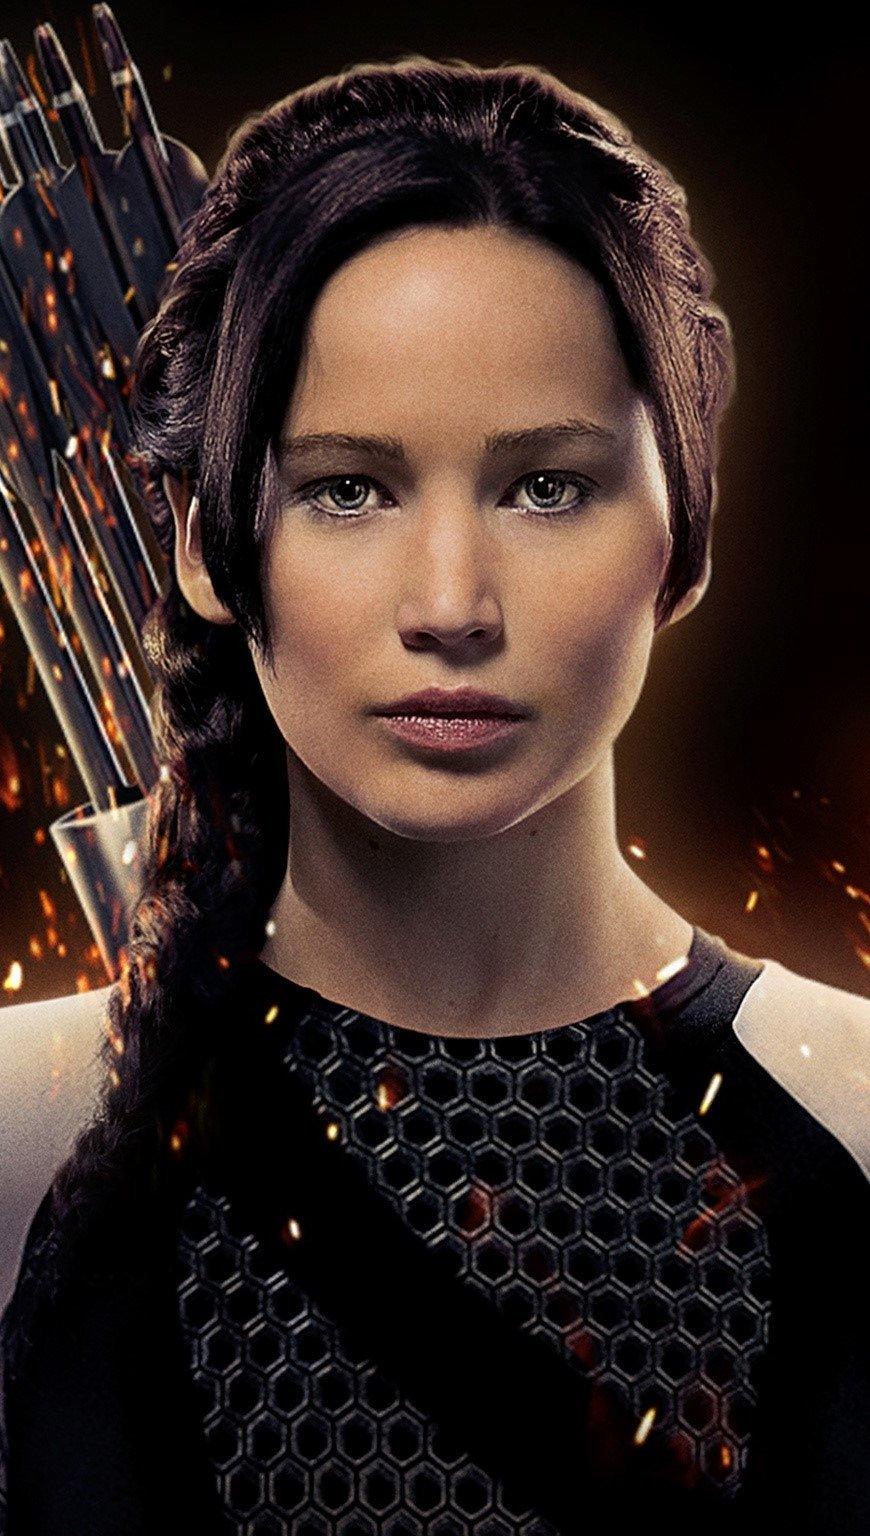 Fondos de pantalla Jennifer Lawrence como Katniss Vertical